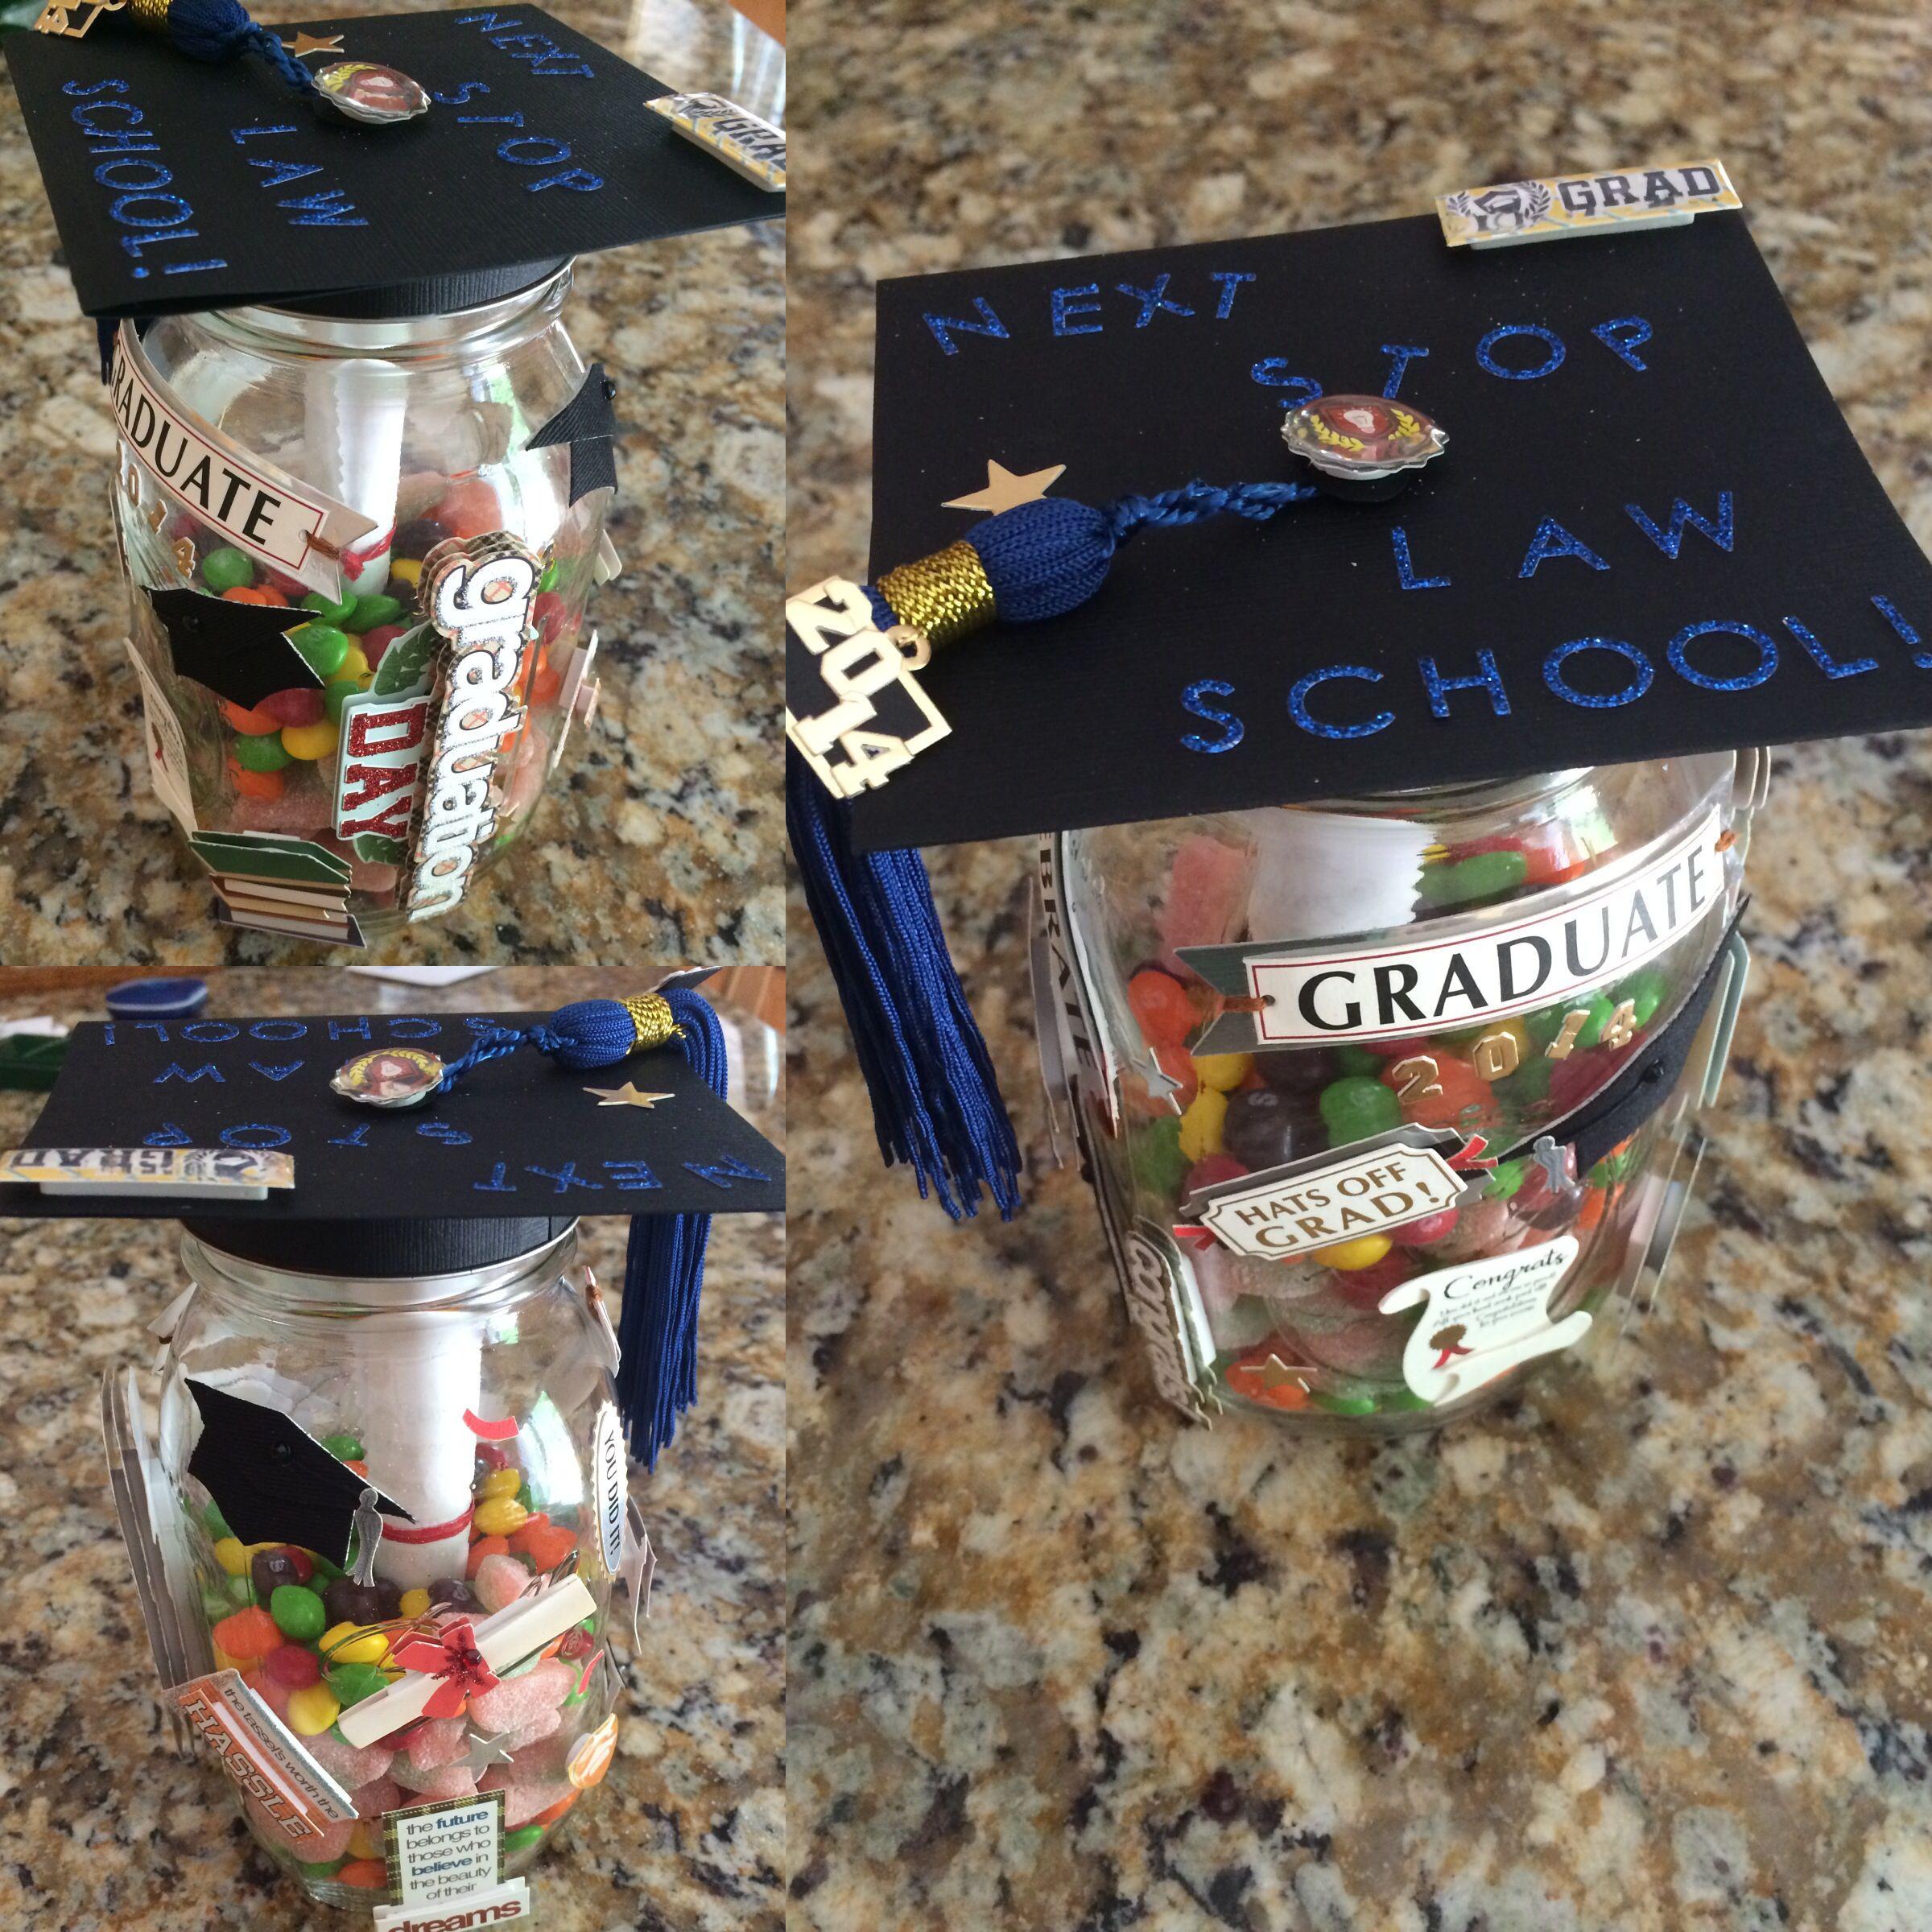 Masters Graduation Gift Ideas For Him  Graduation Gift For Boyfriend DIY